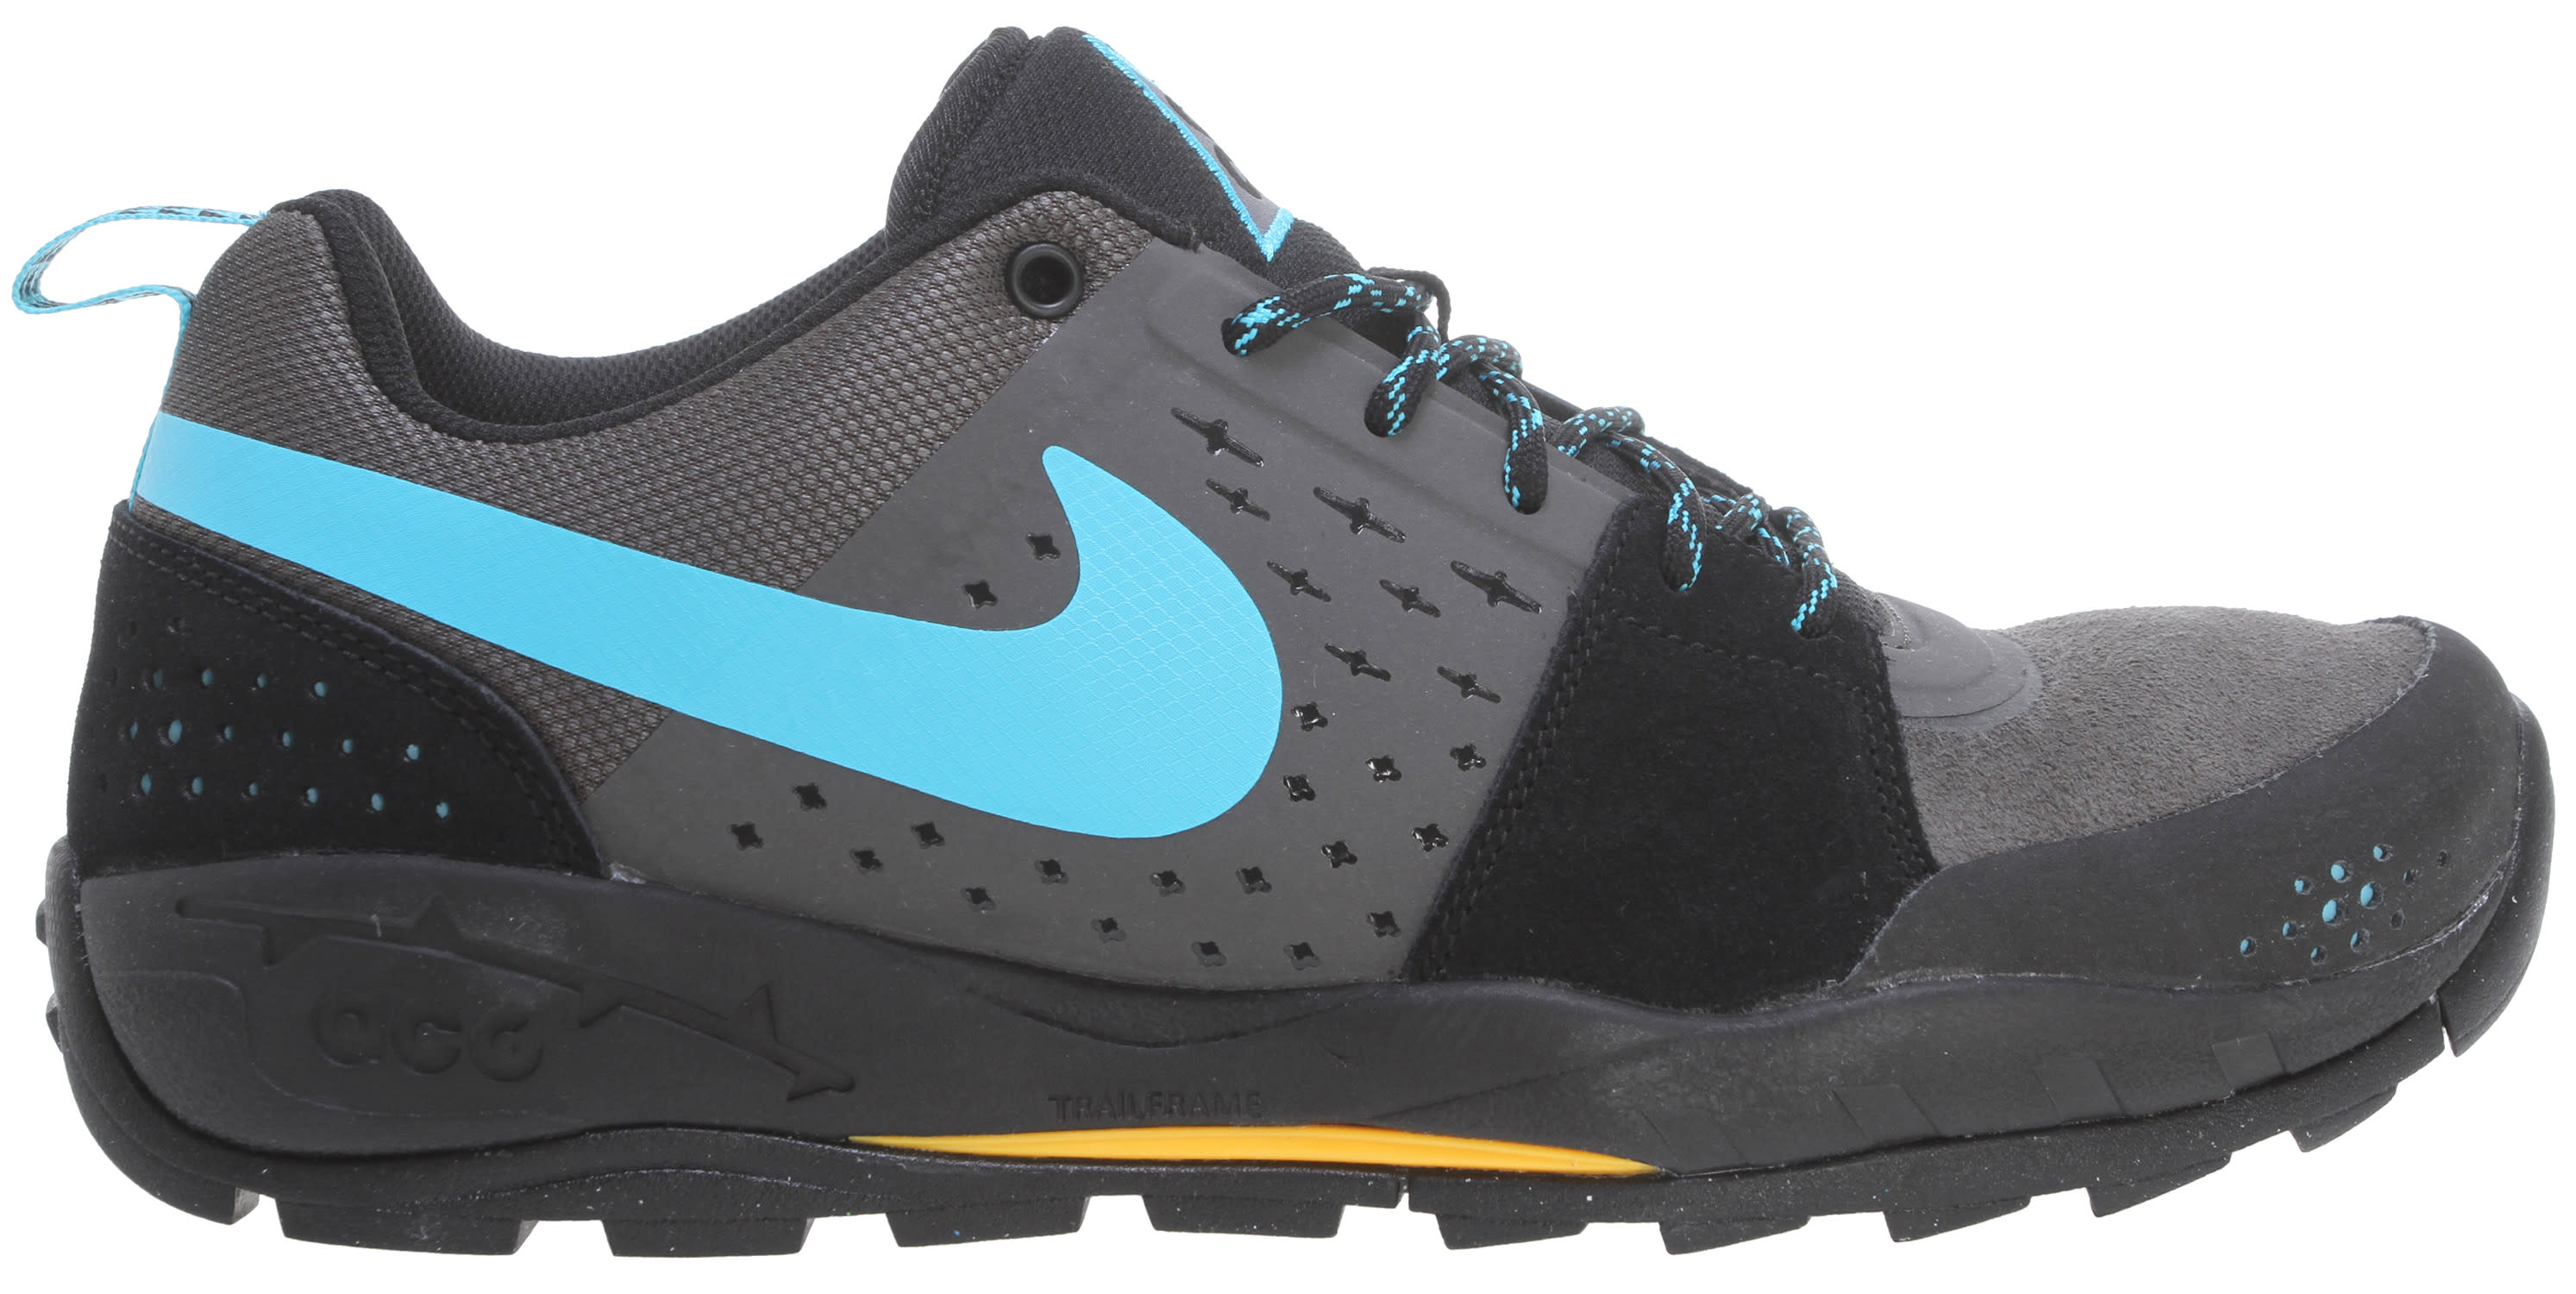 ccd750362ccf6 Nike Air Alder Low Shoes - thumbnail 1